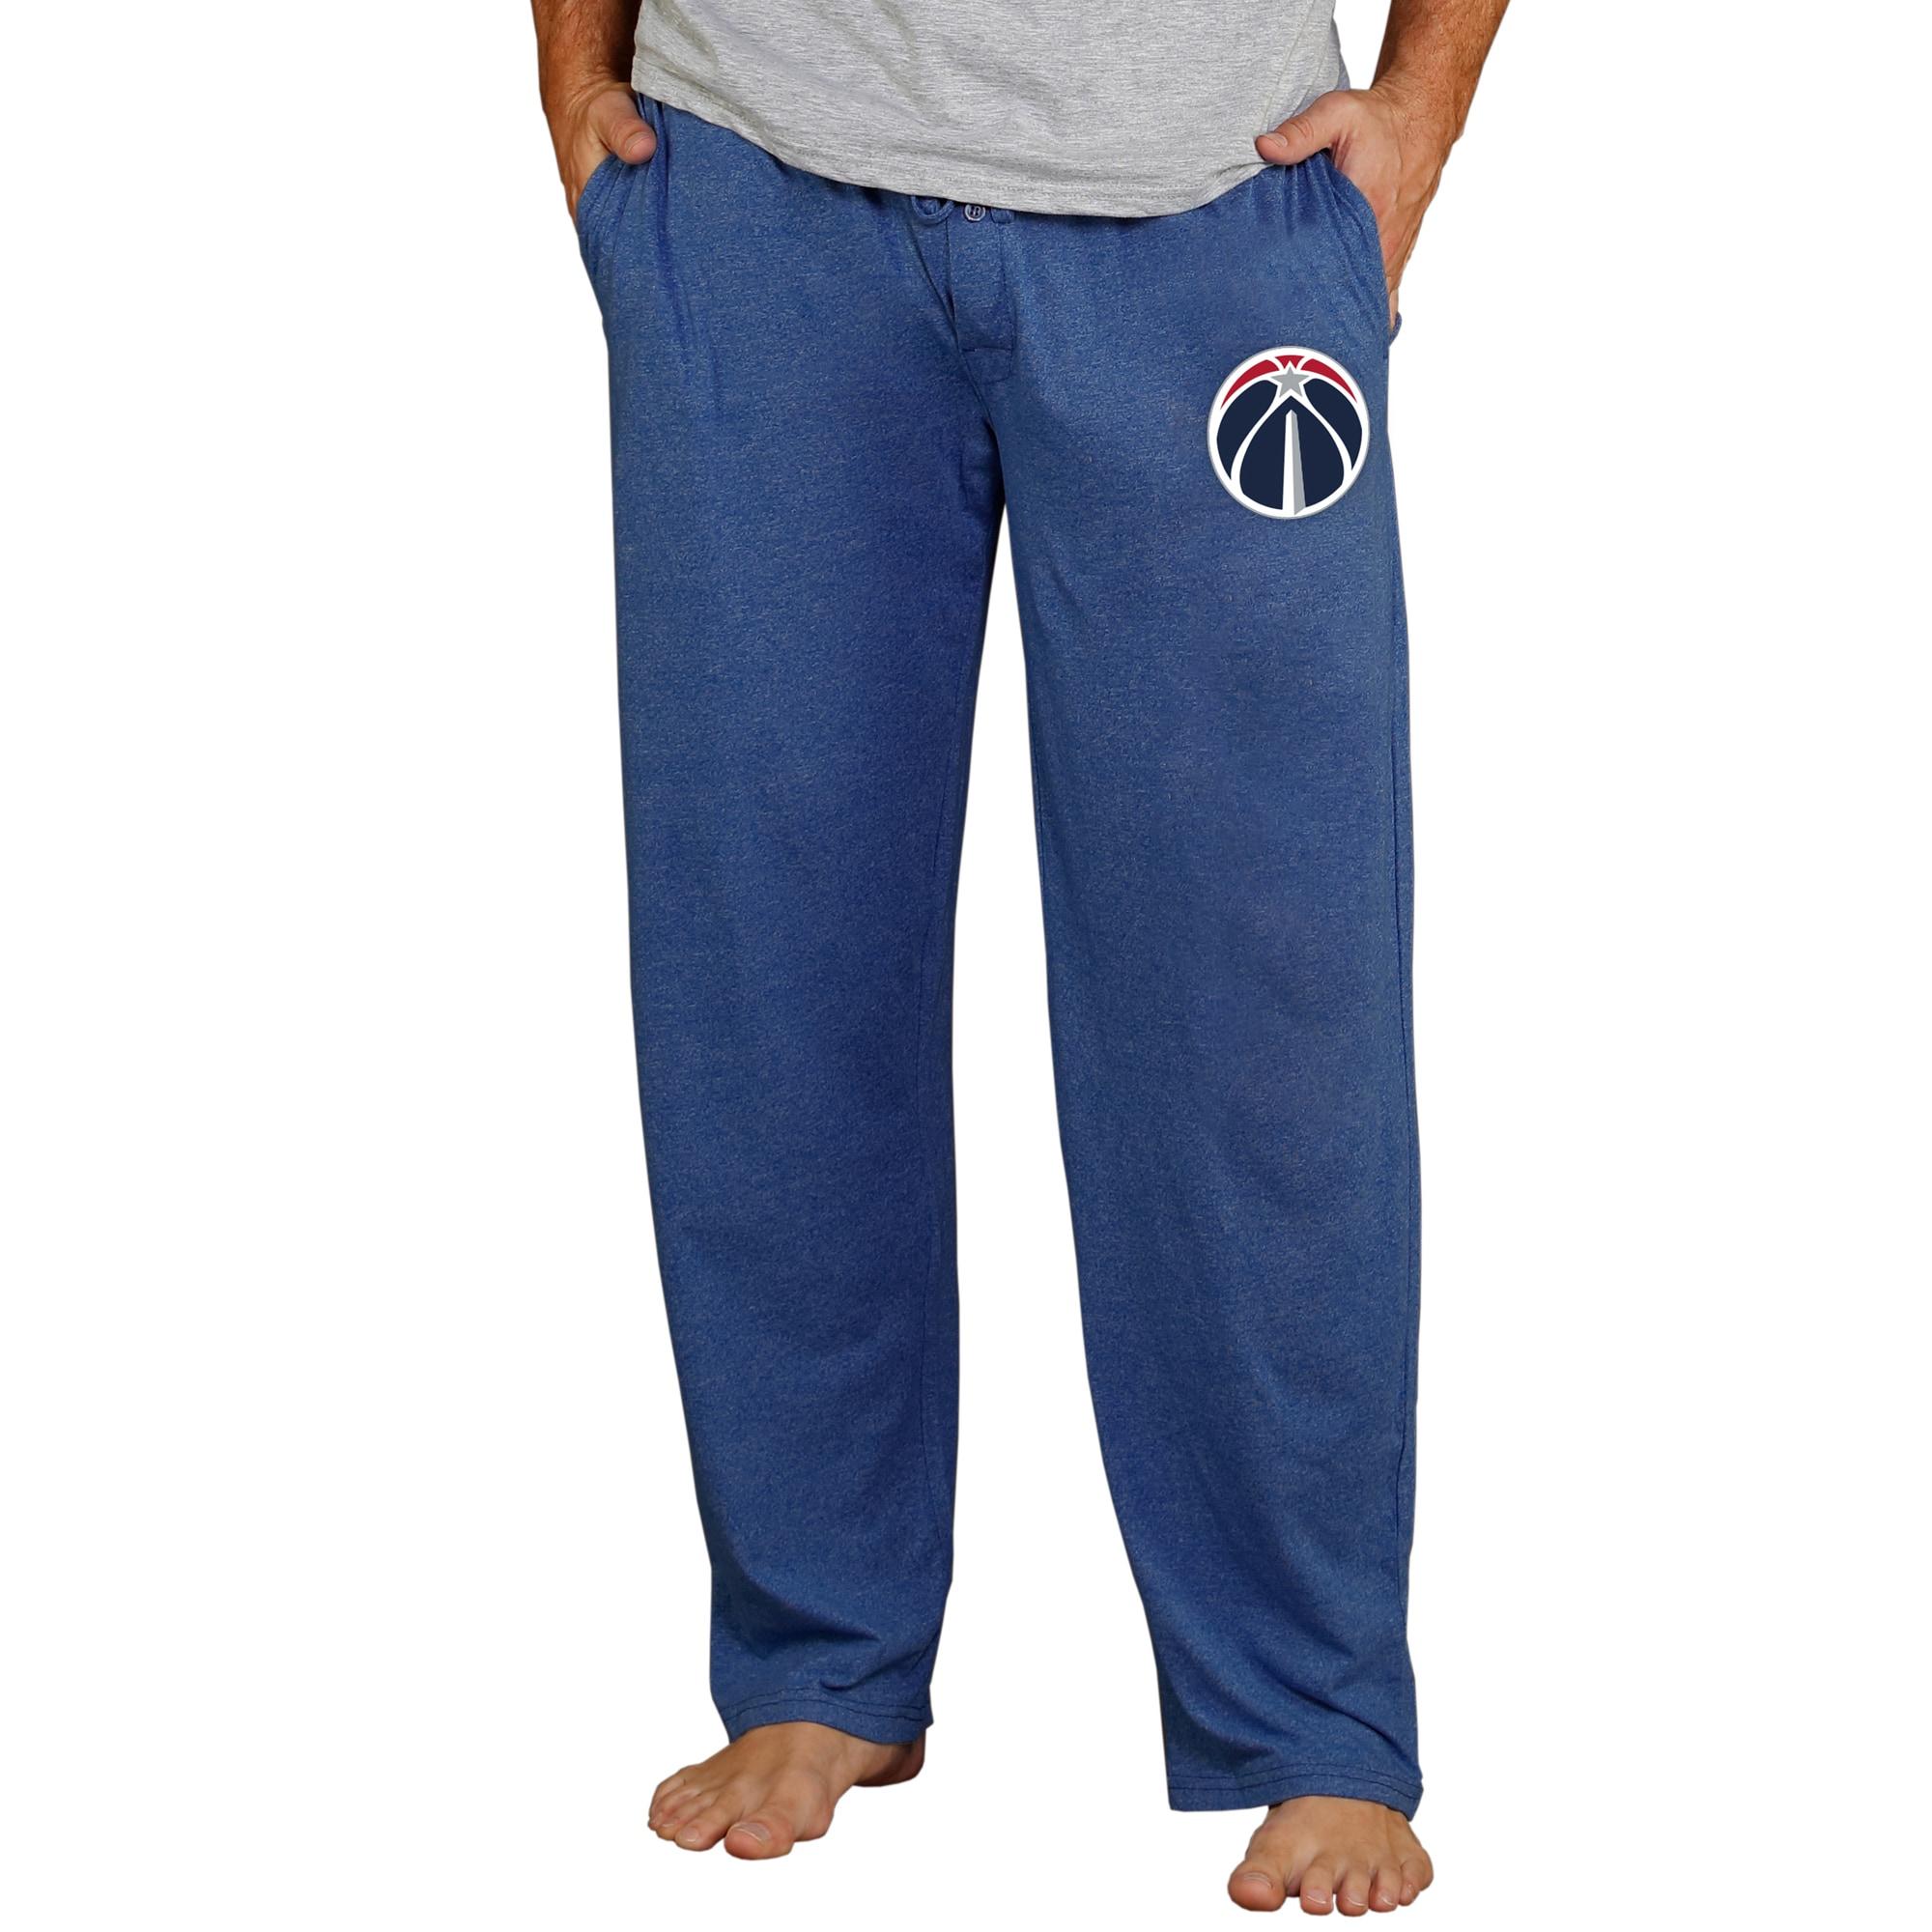 Washington Wizards Concepts Sport Quest Knit Lounge Pants - Navy